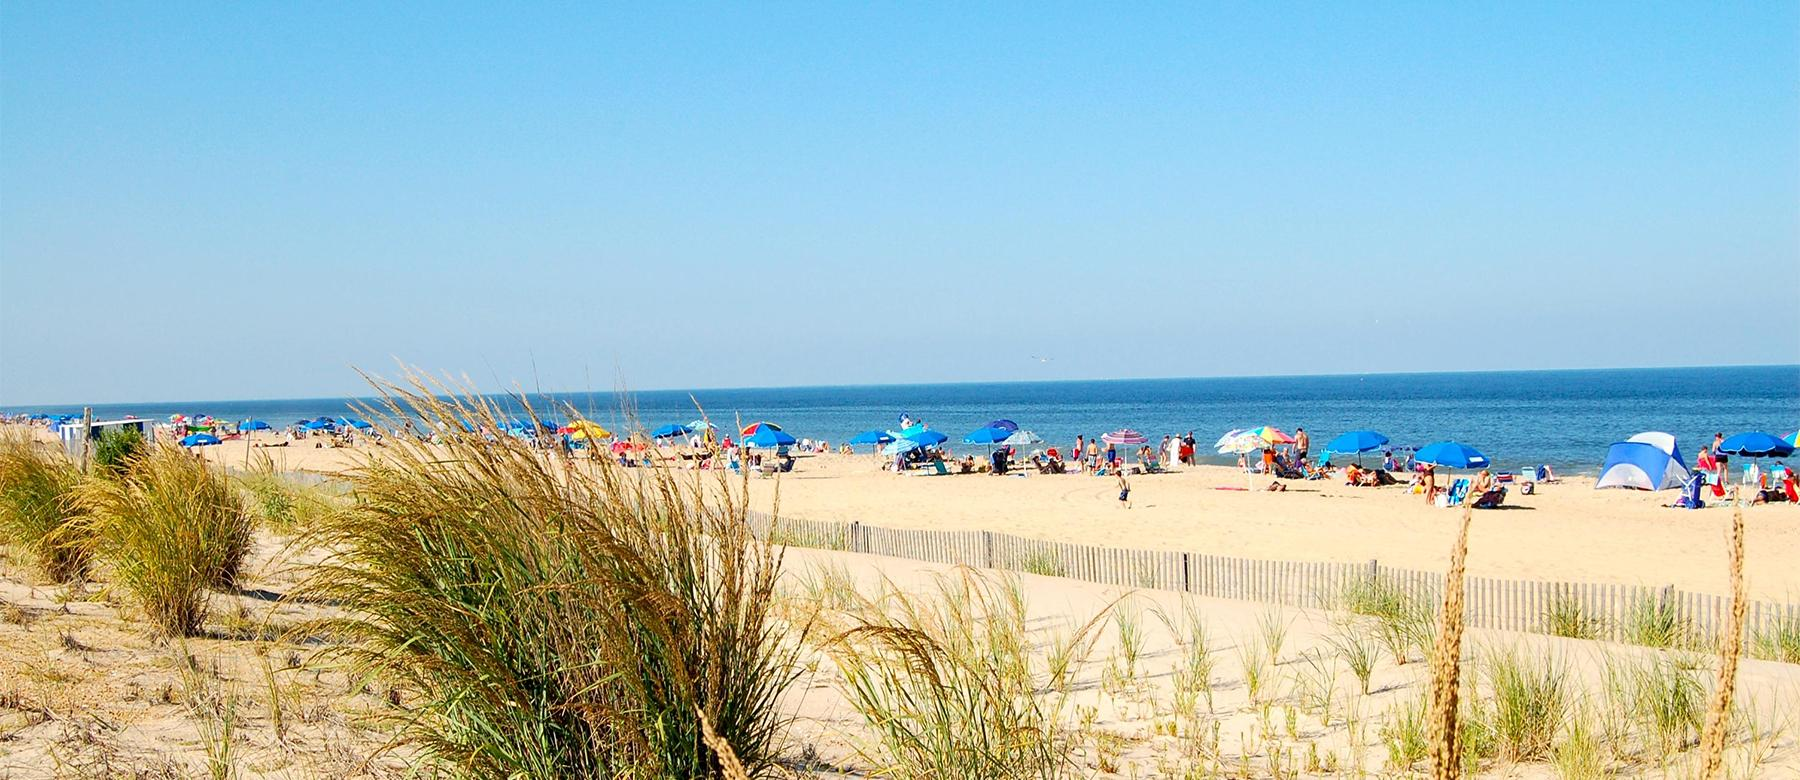 Personals in dewey beach delaware